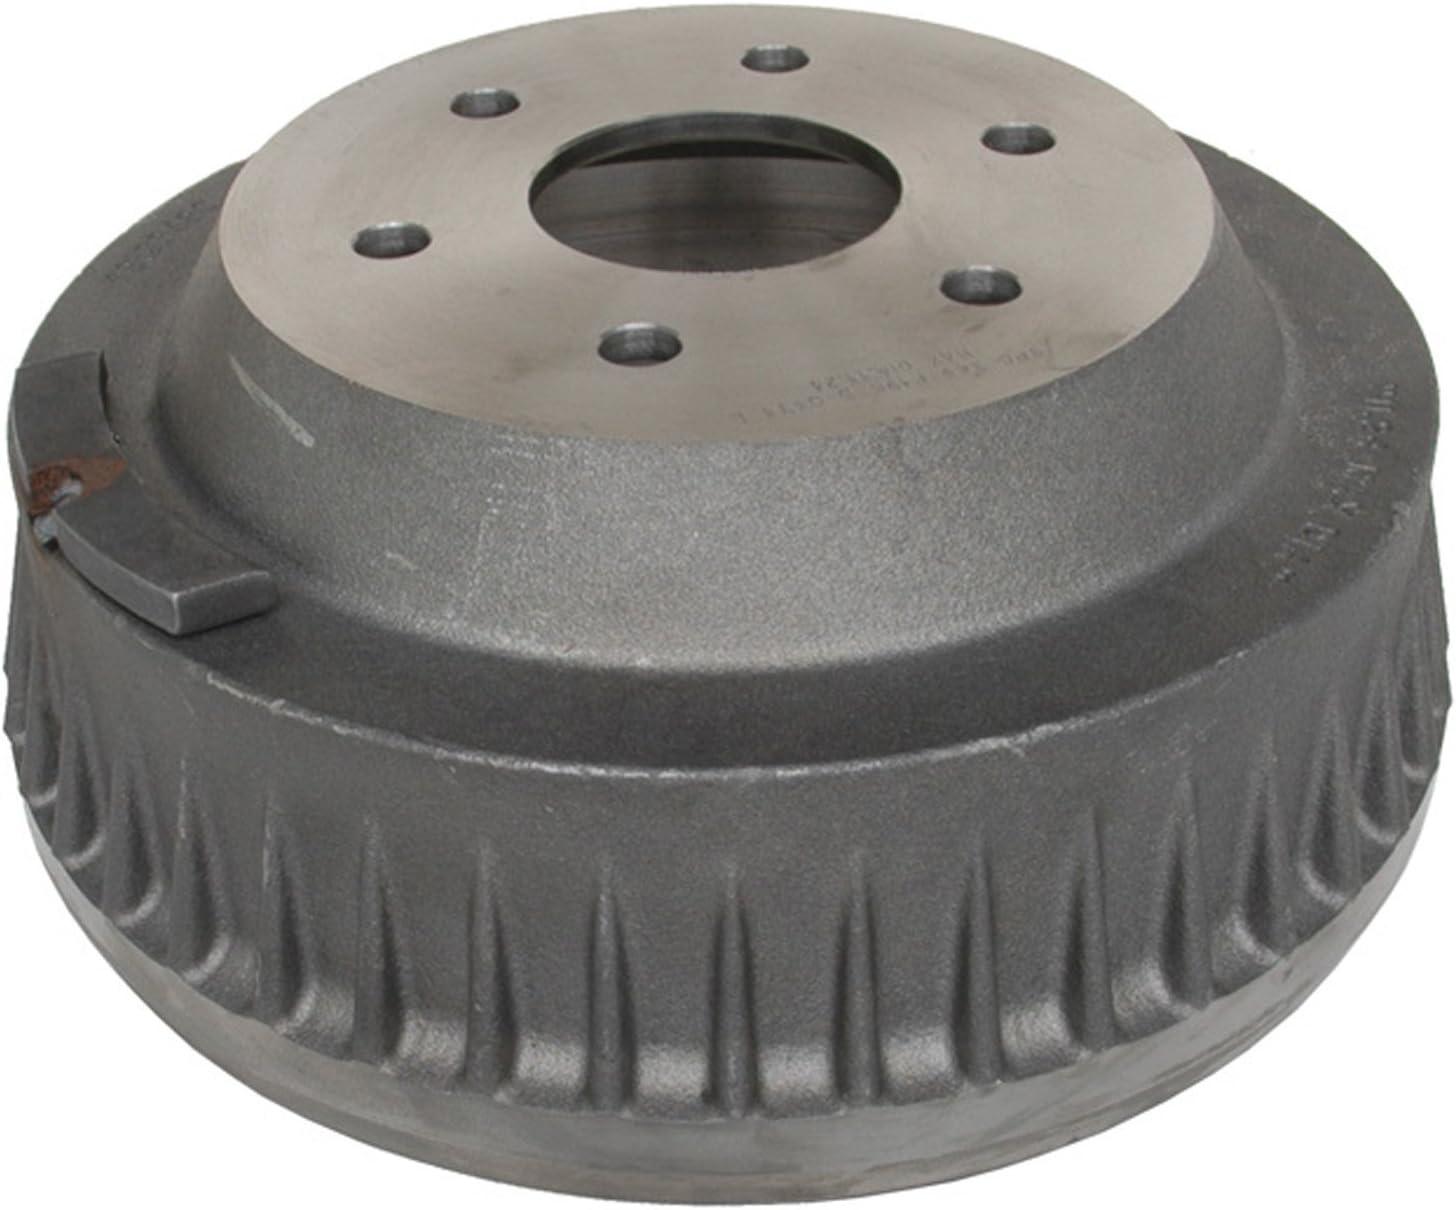 Max 61% OFF ACDelco Austin Mall Professional 18B187 Rear Drum Brake